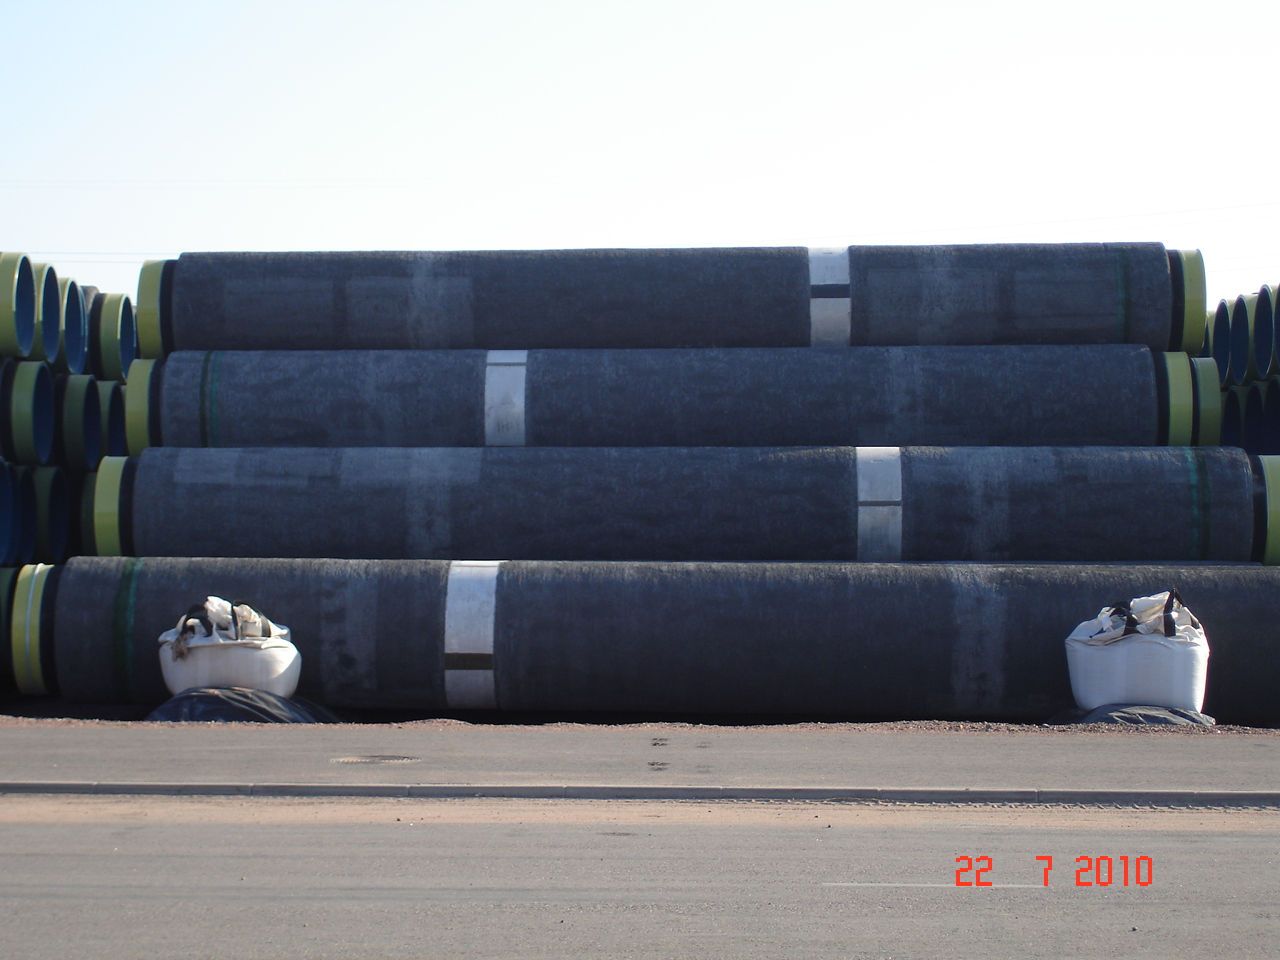 Nord Stream Pipeline